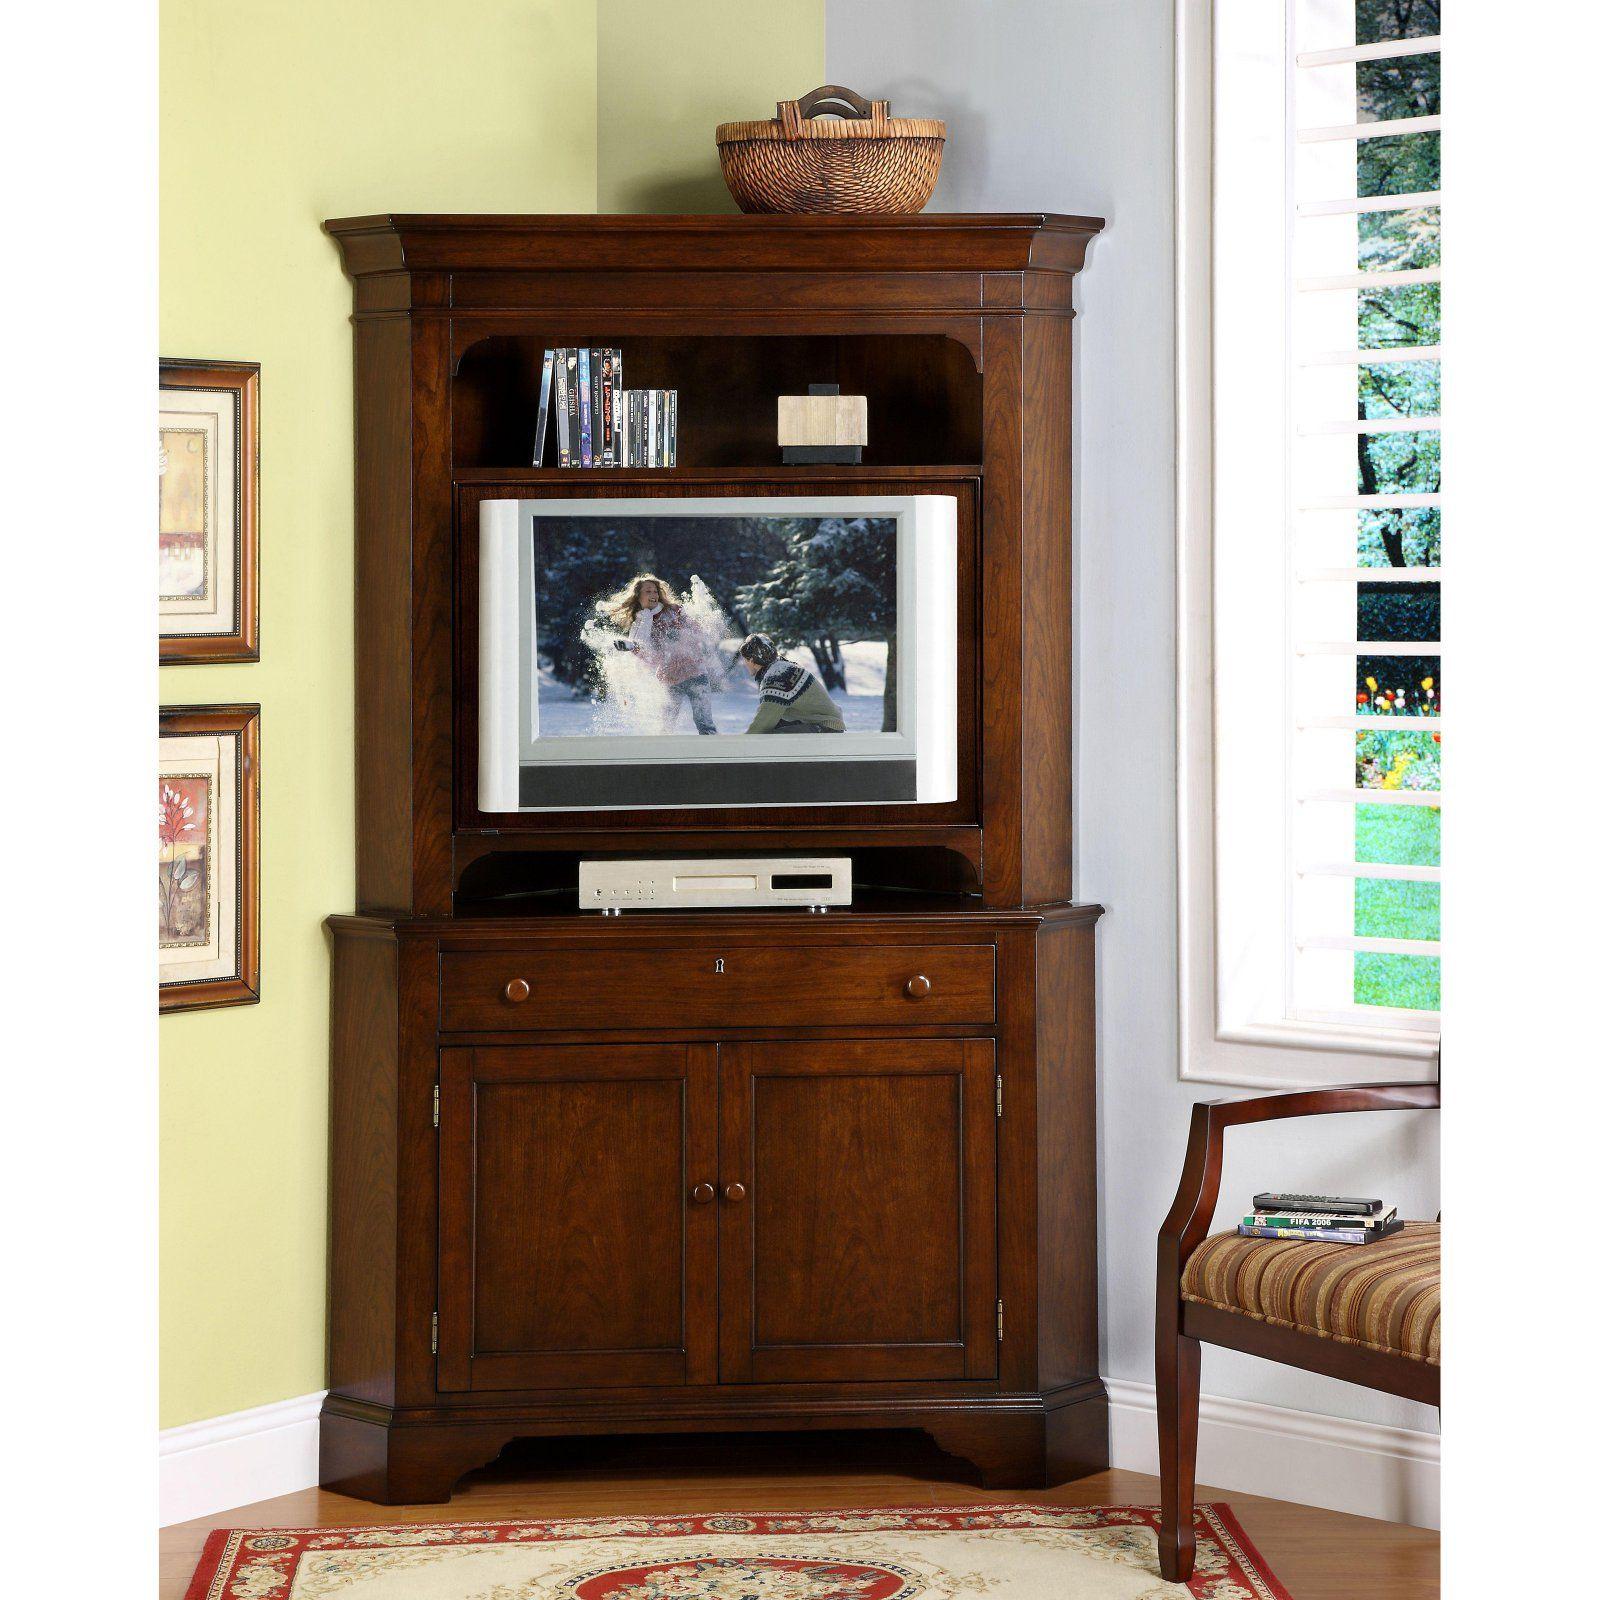 corner tv armoire | TV cabinets | Pinterest | Tv armoire, Corner ...